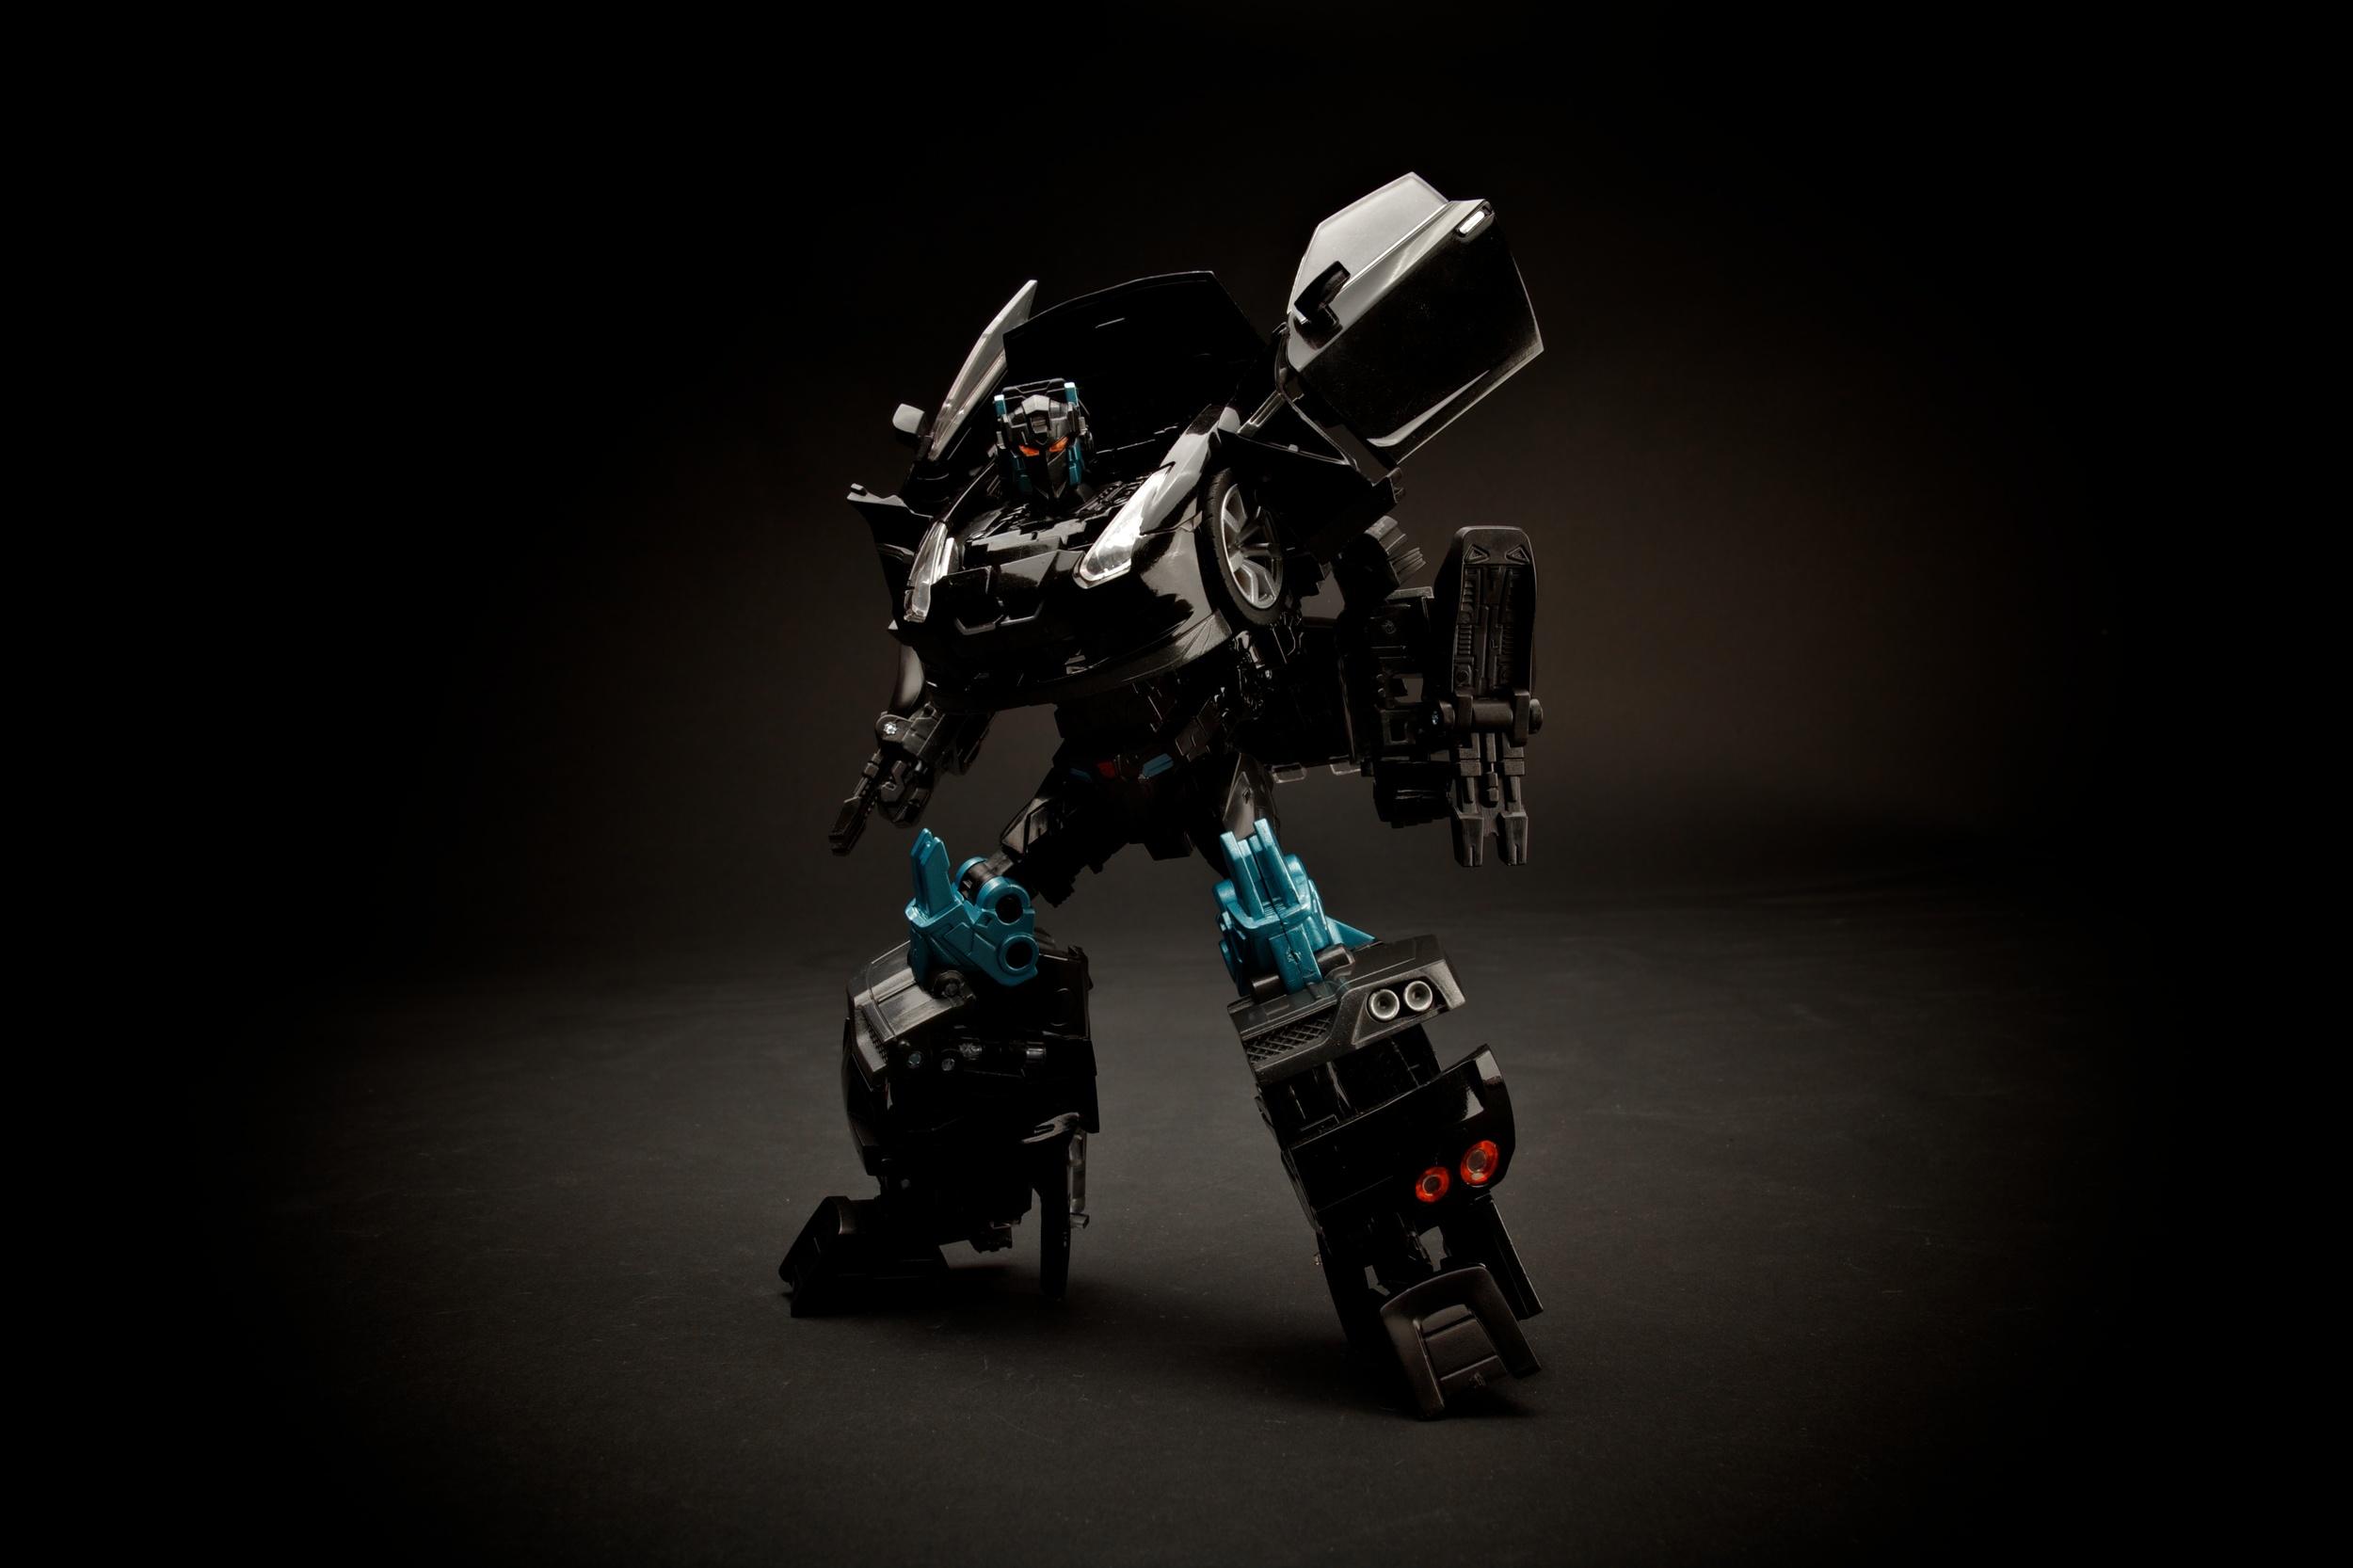 GTR-Optimus-Blk4.jpg